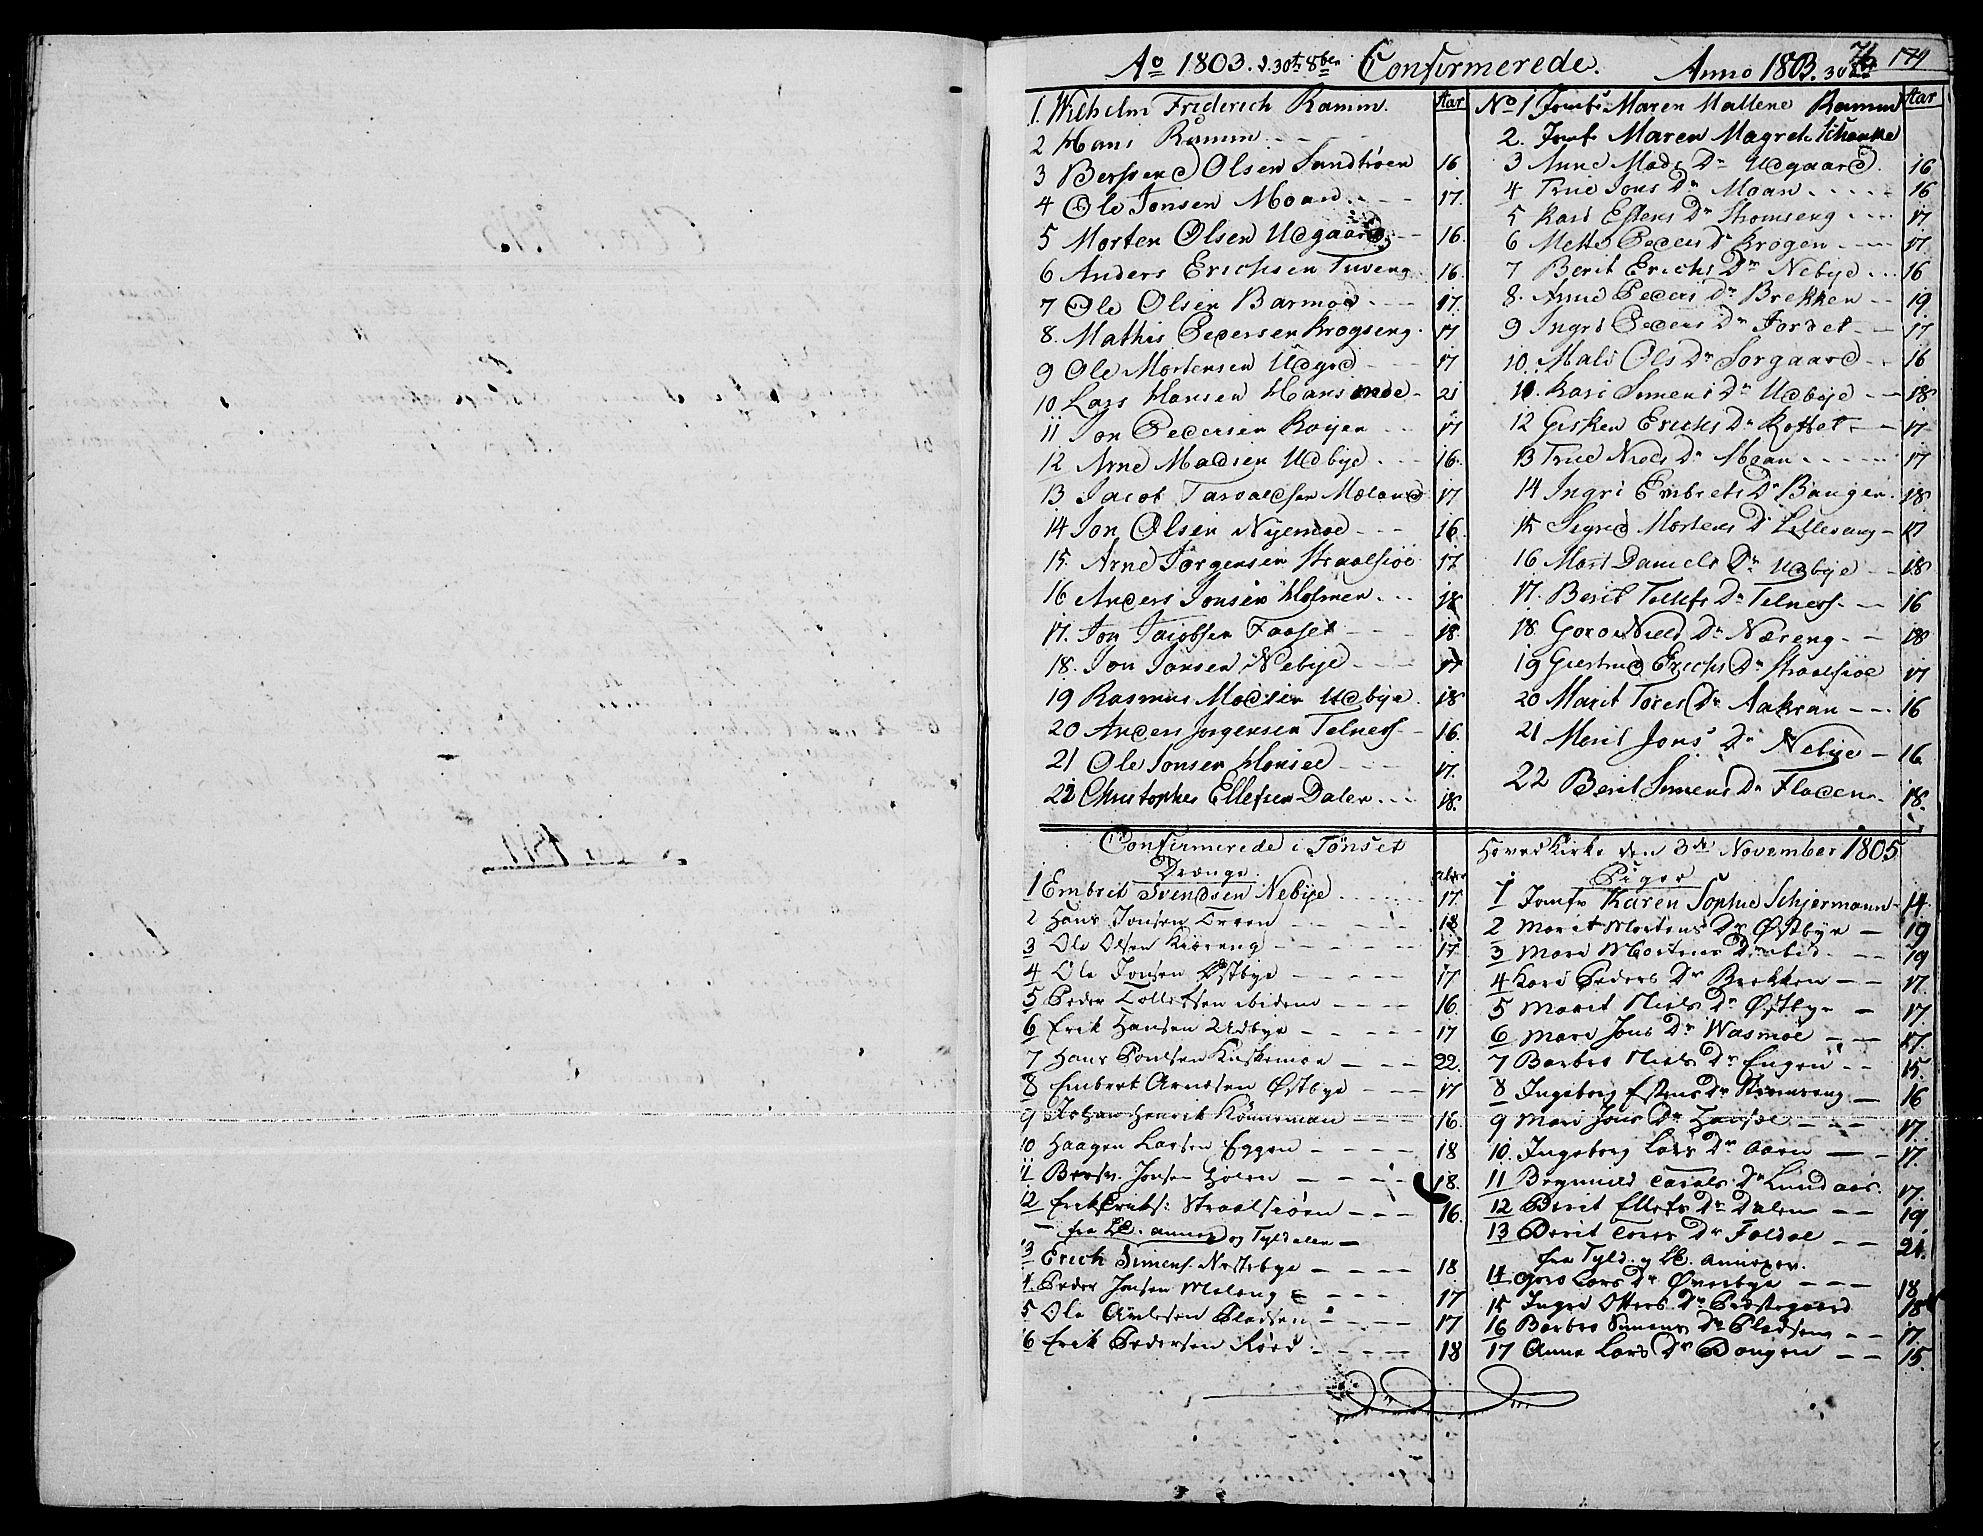 SAH, Tynset prestekontor, Ministerialbok nr. 15, 1801-1814, s. 76